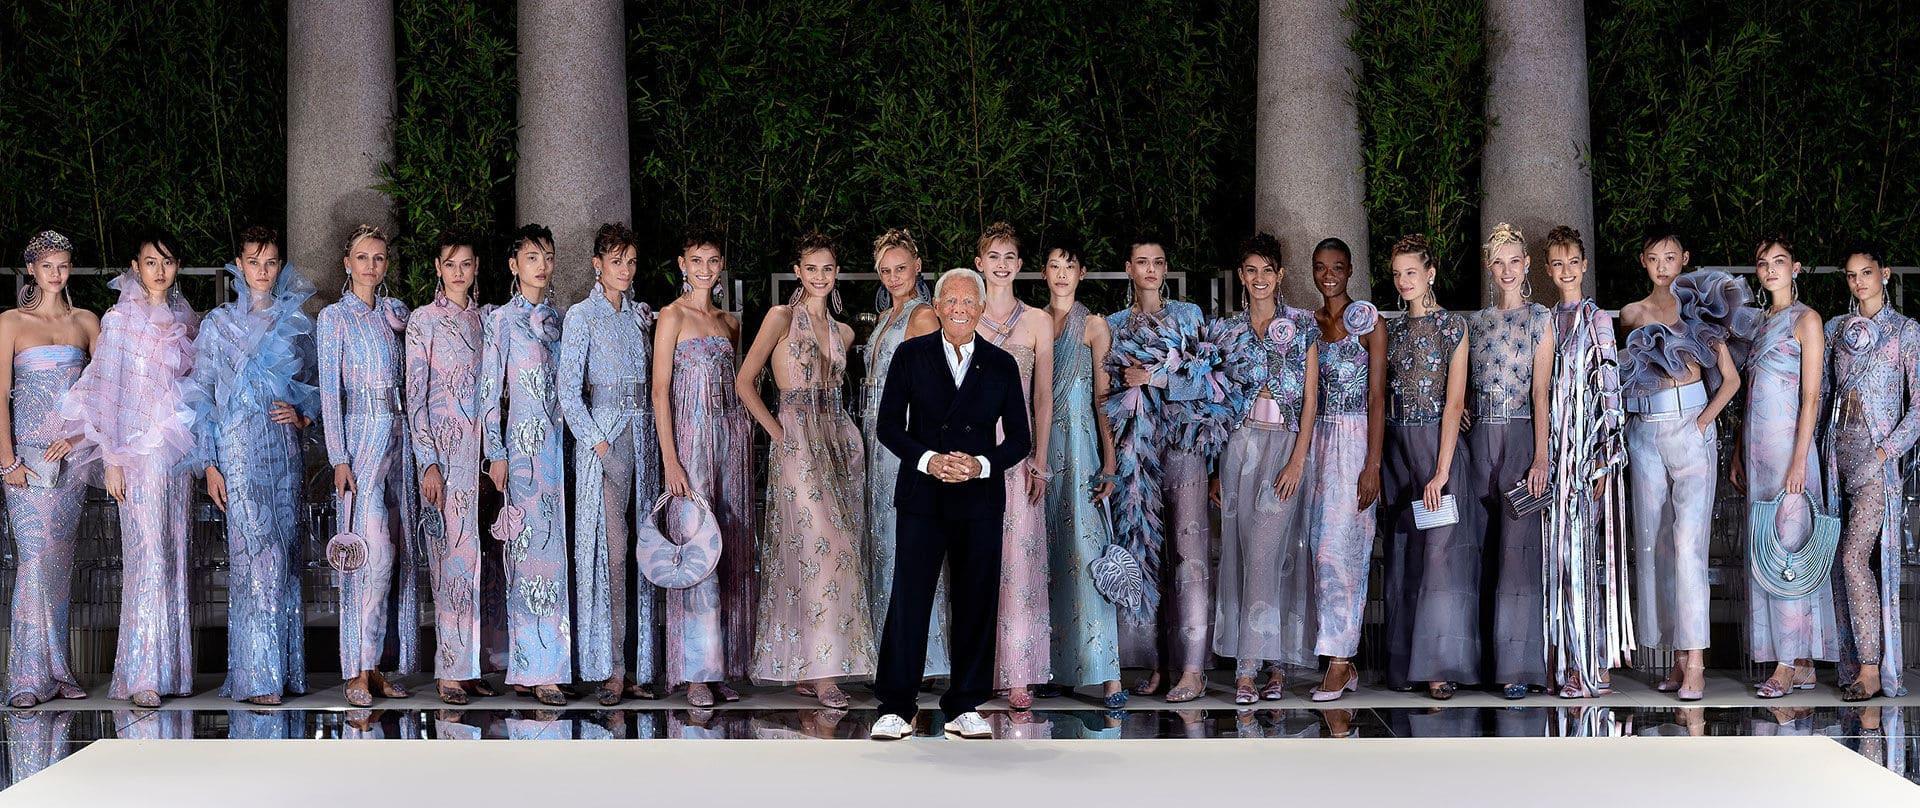 Giorgio Armani SS 2020 Fashion Show. Credit: Armani